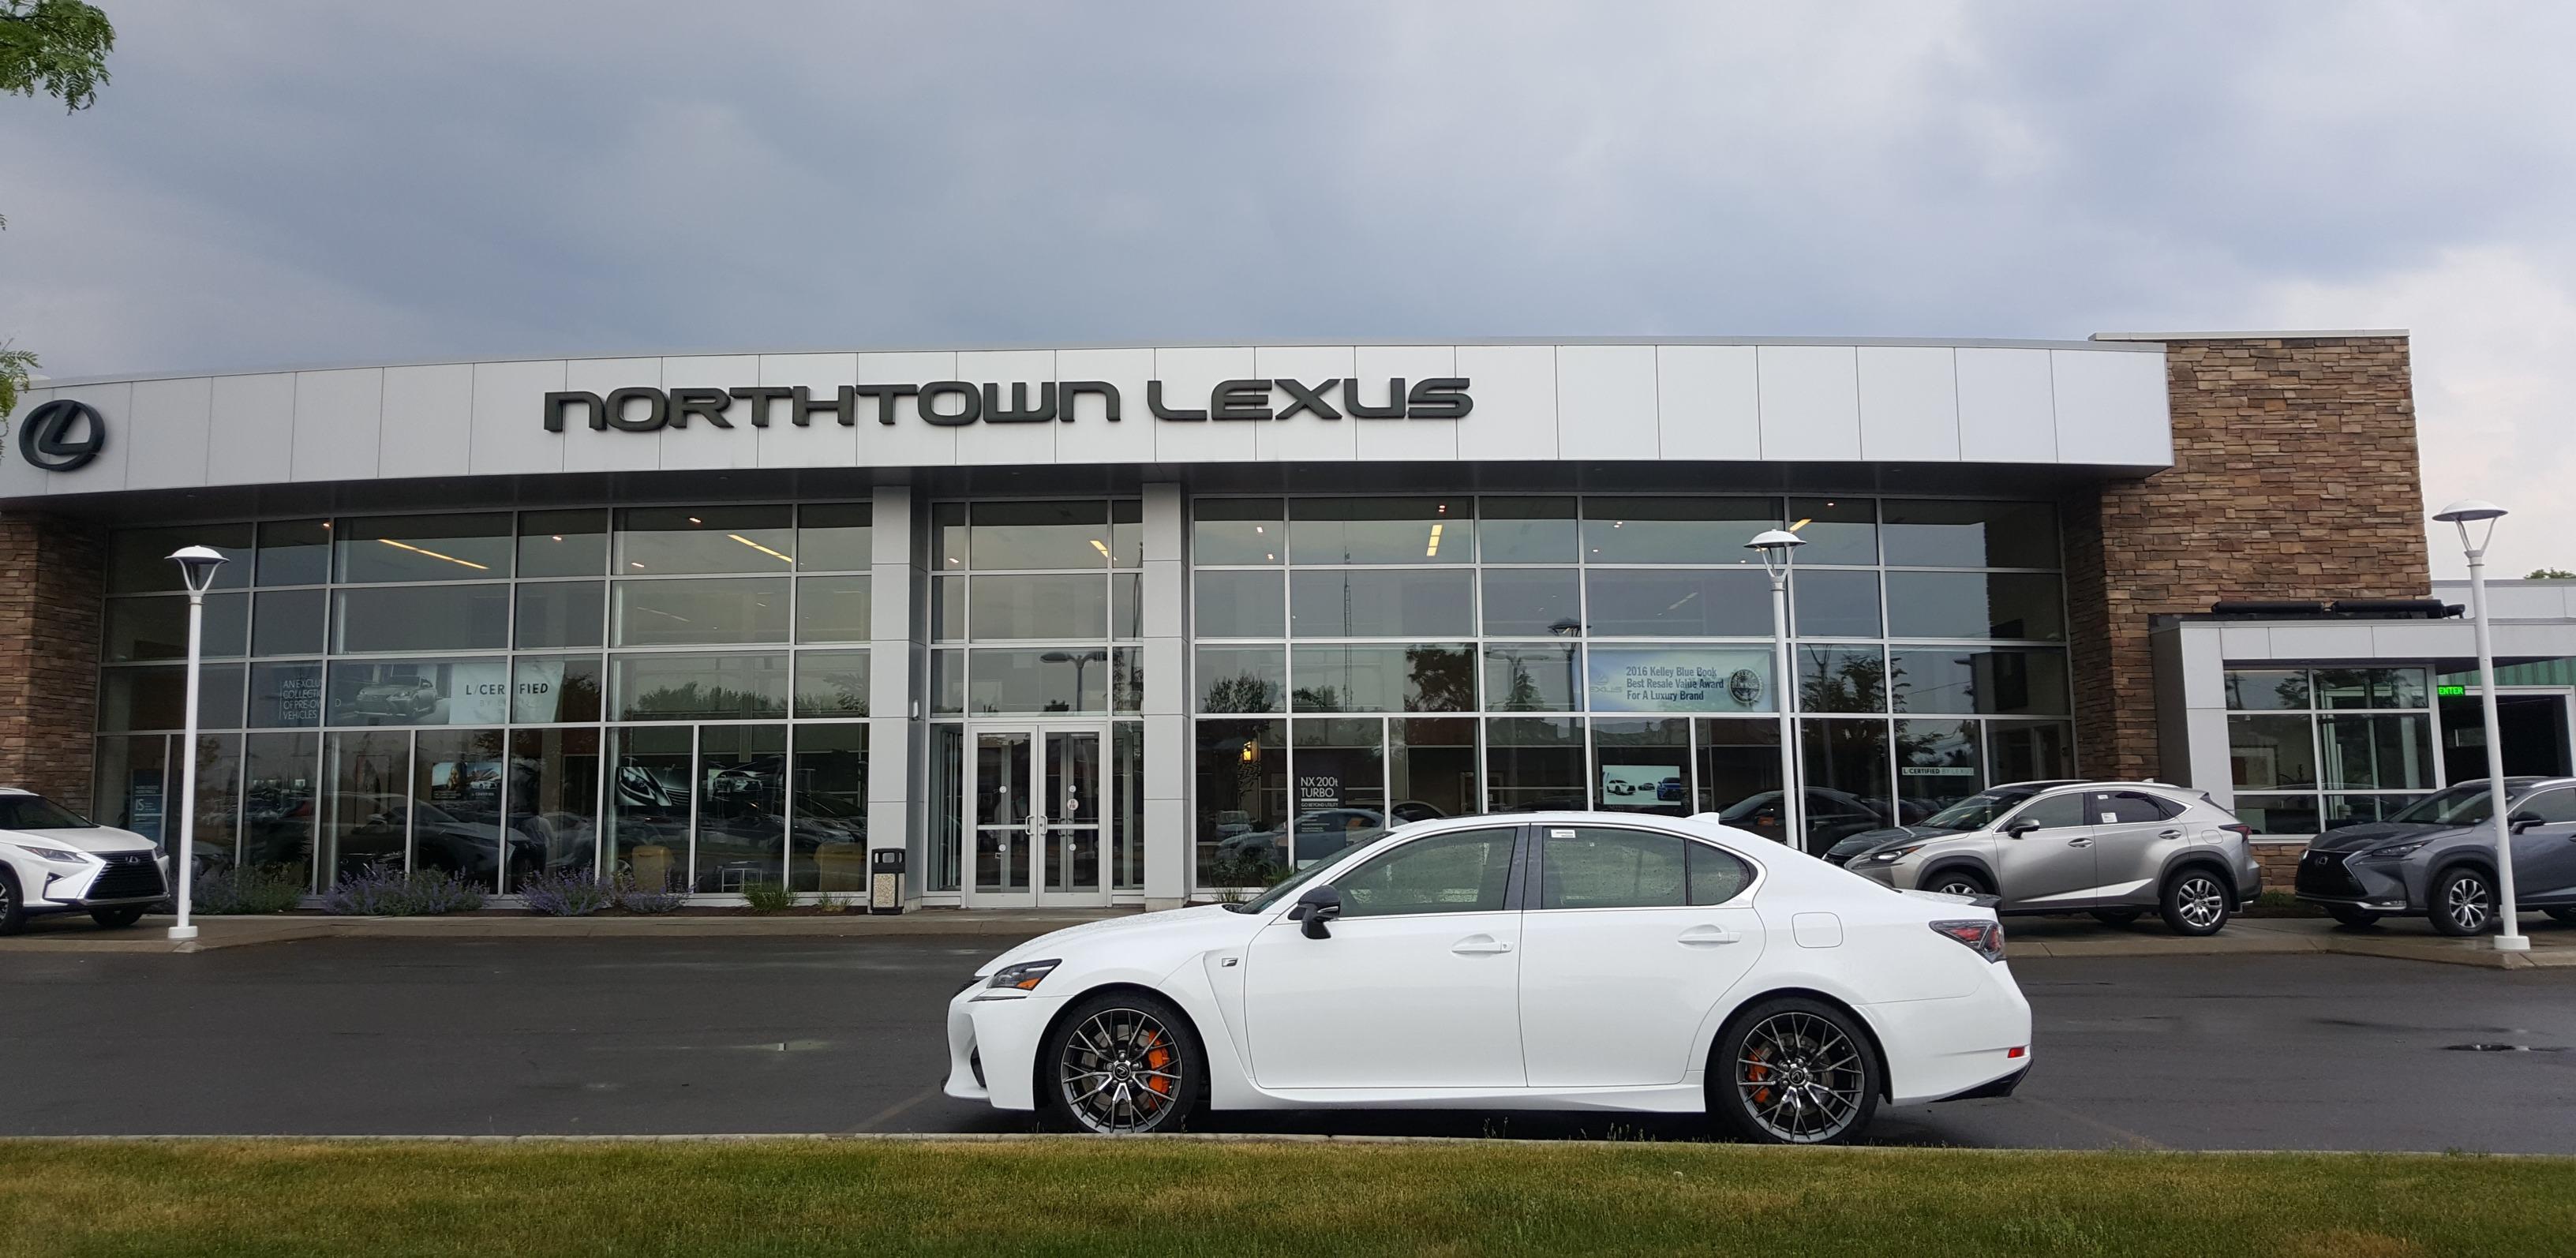 Northtown Lexus image 6